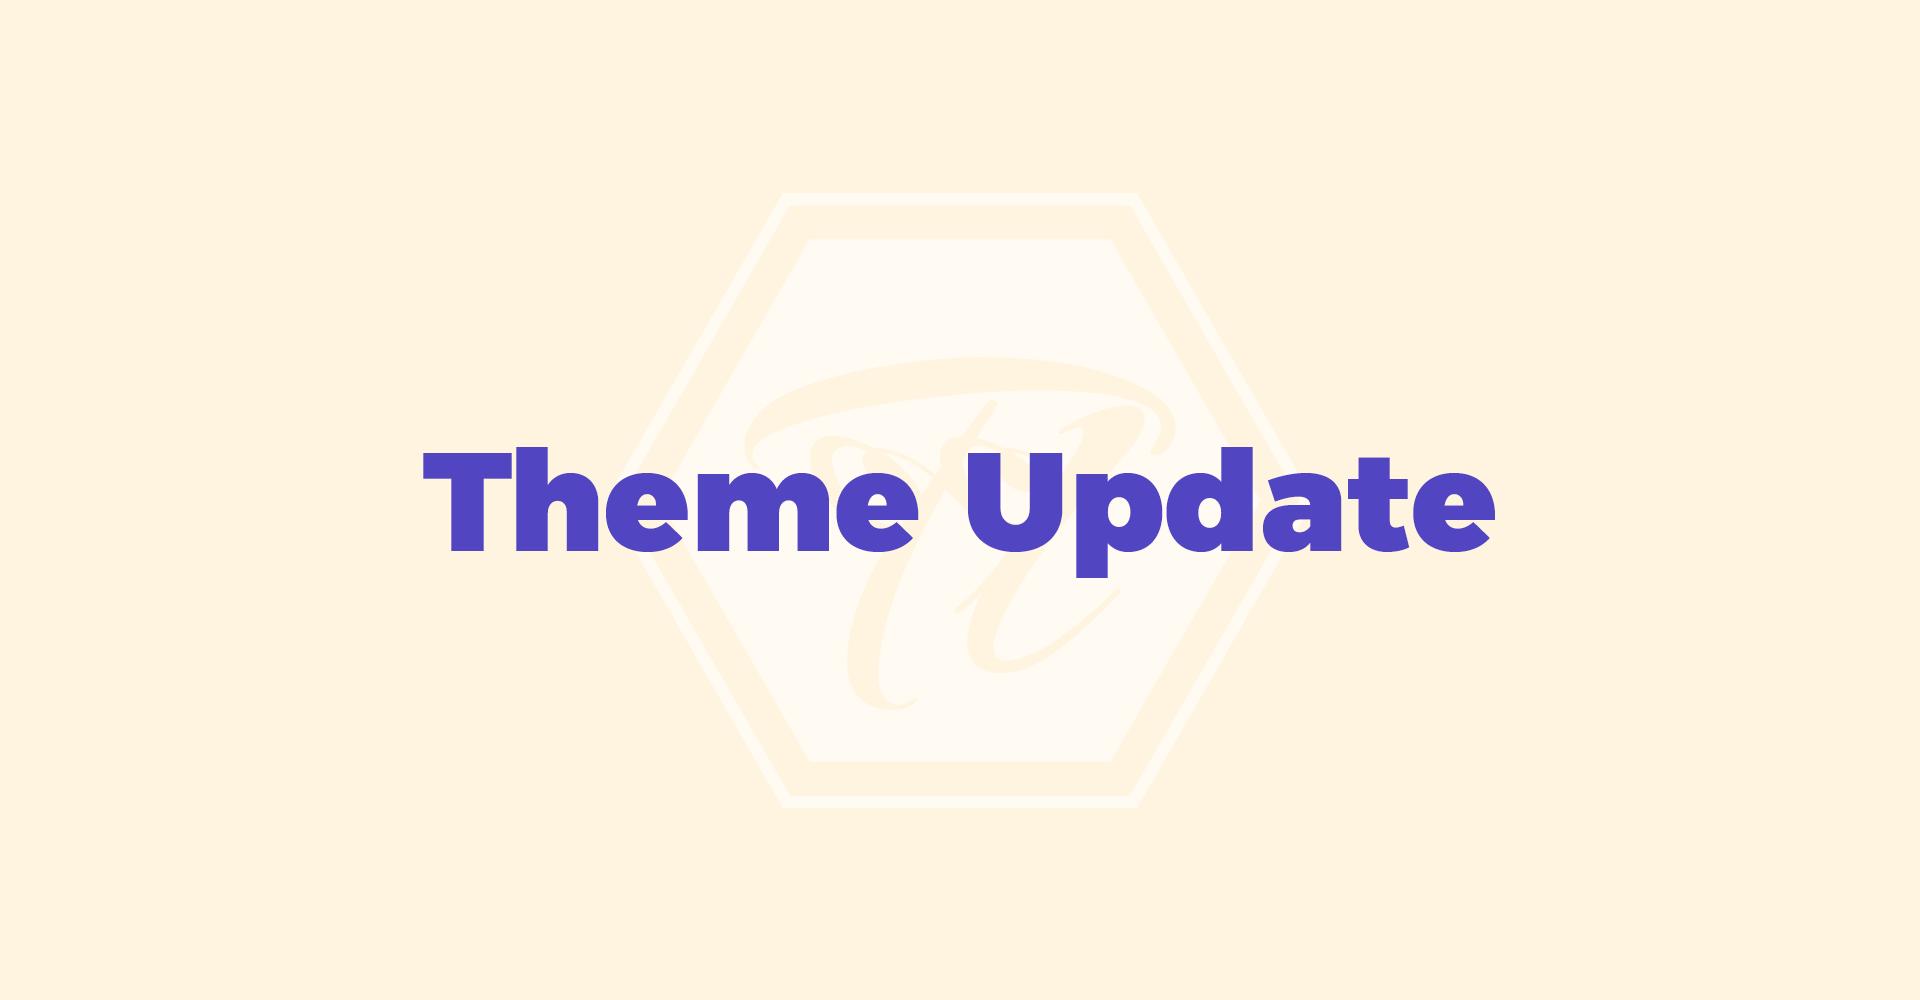 theme_update 1 1 2